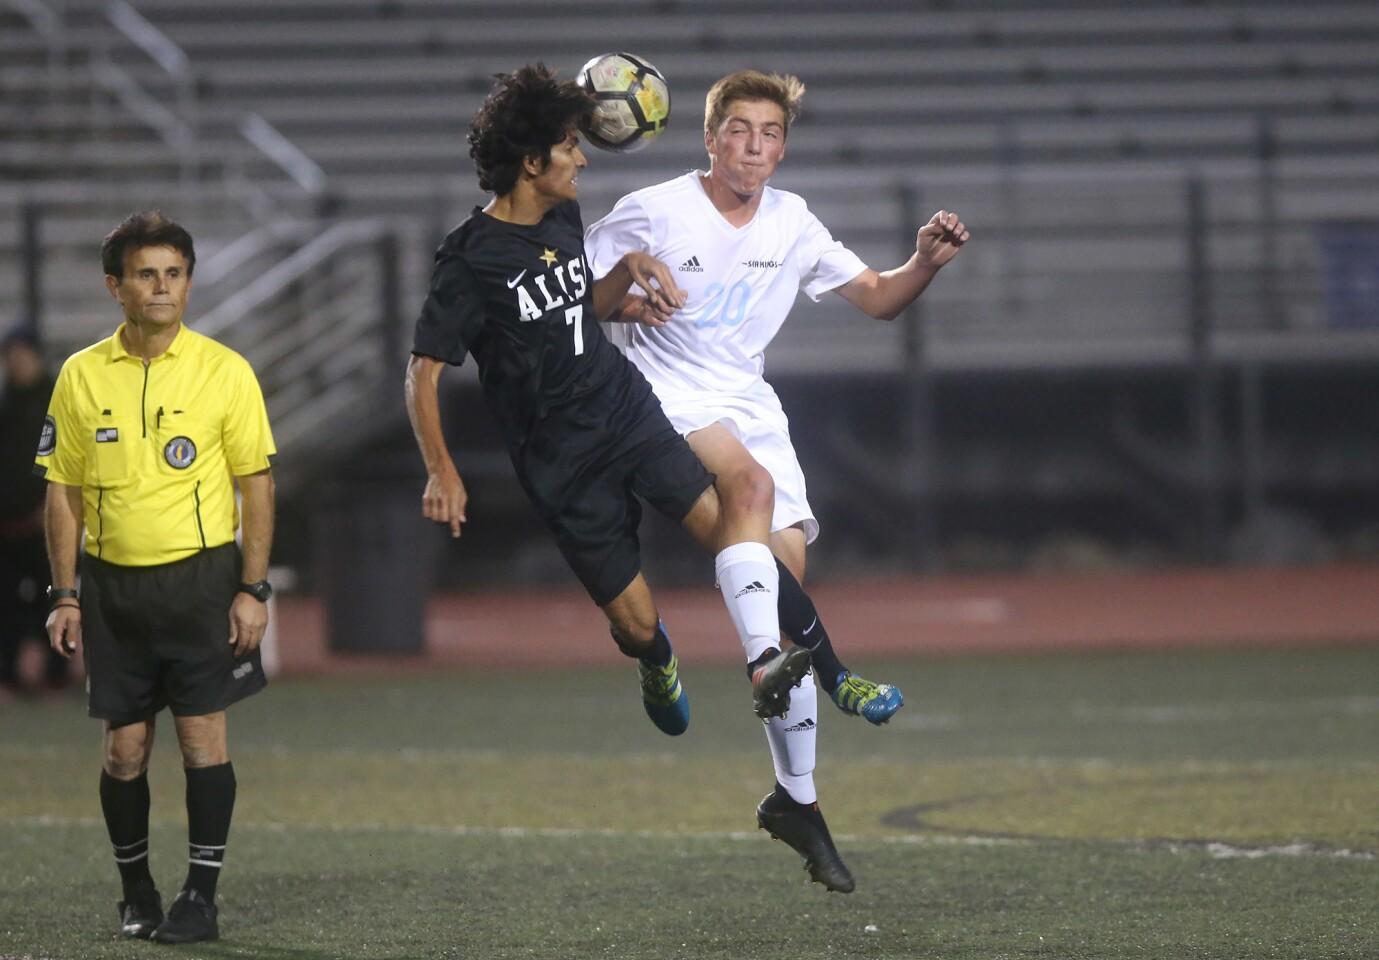 Photo Gallery: Corona del Mar vs. Aliso Niguel in boys' soccer